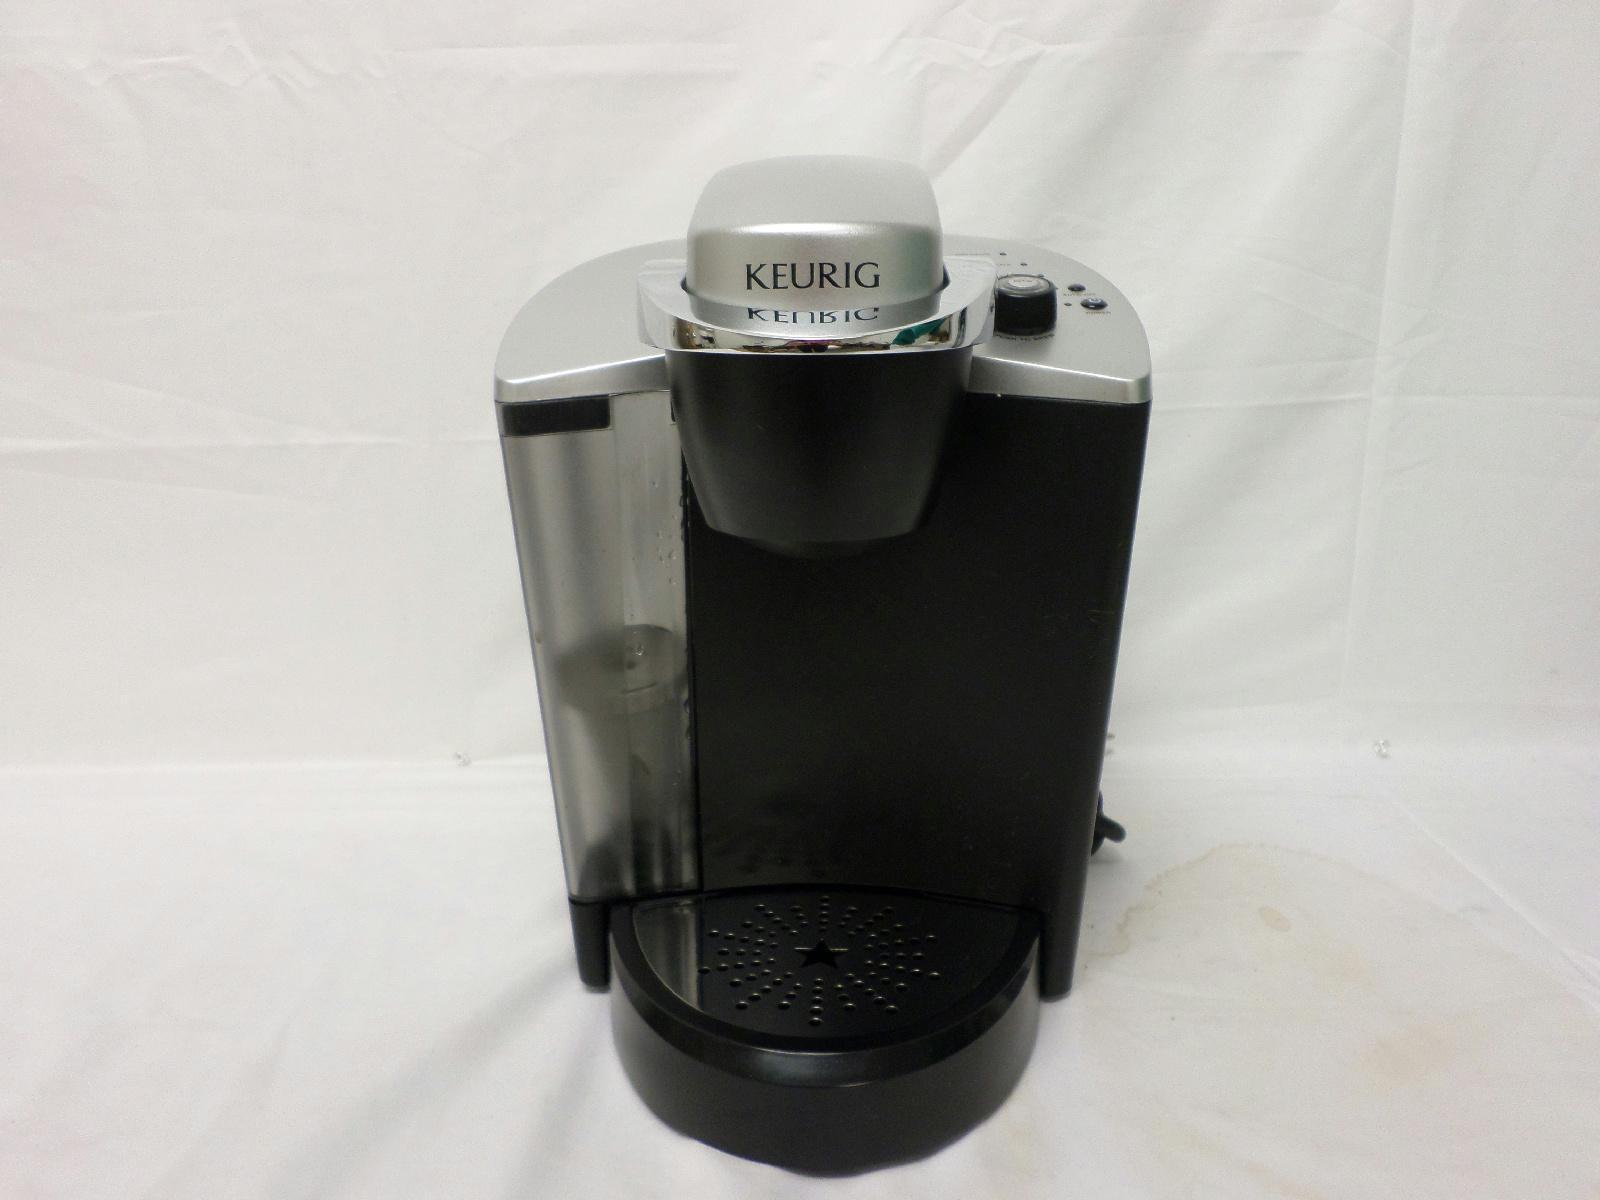 K Cup Coffee Maker For Office : Keurig Office Coffee Maker Gourmet Single Cup Brewing System B145 Black eBay